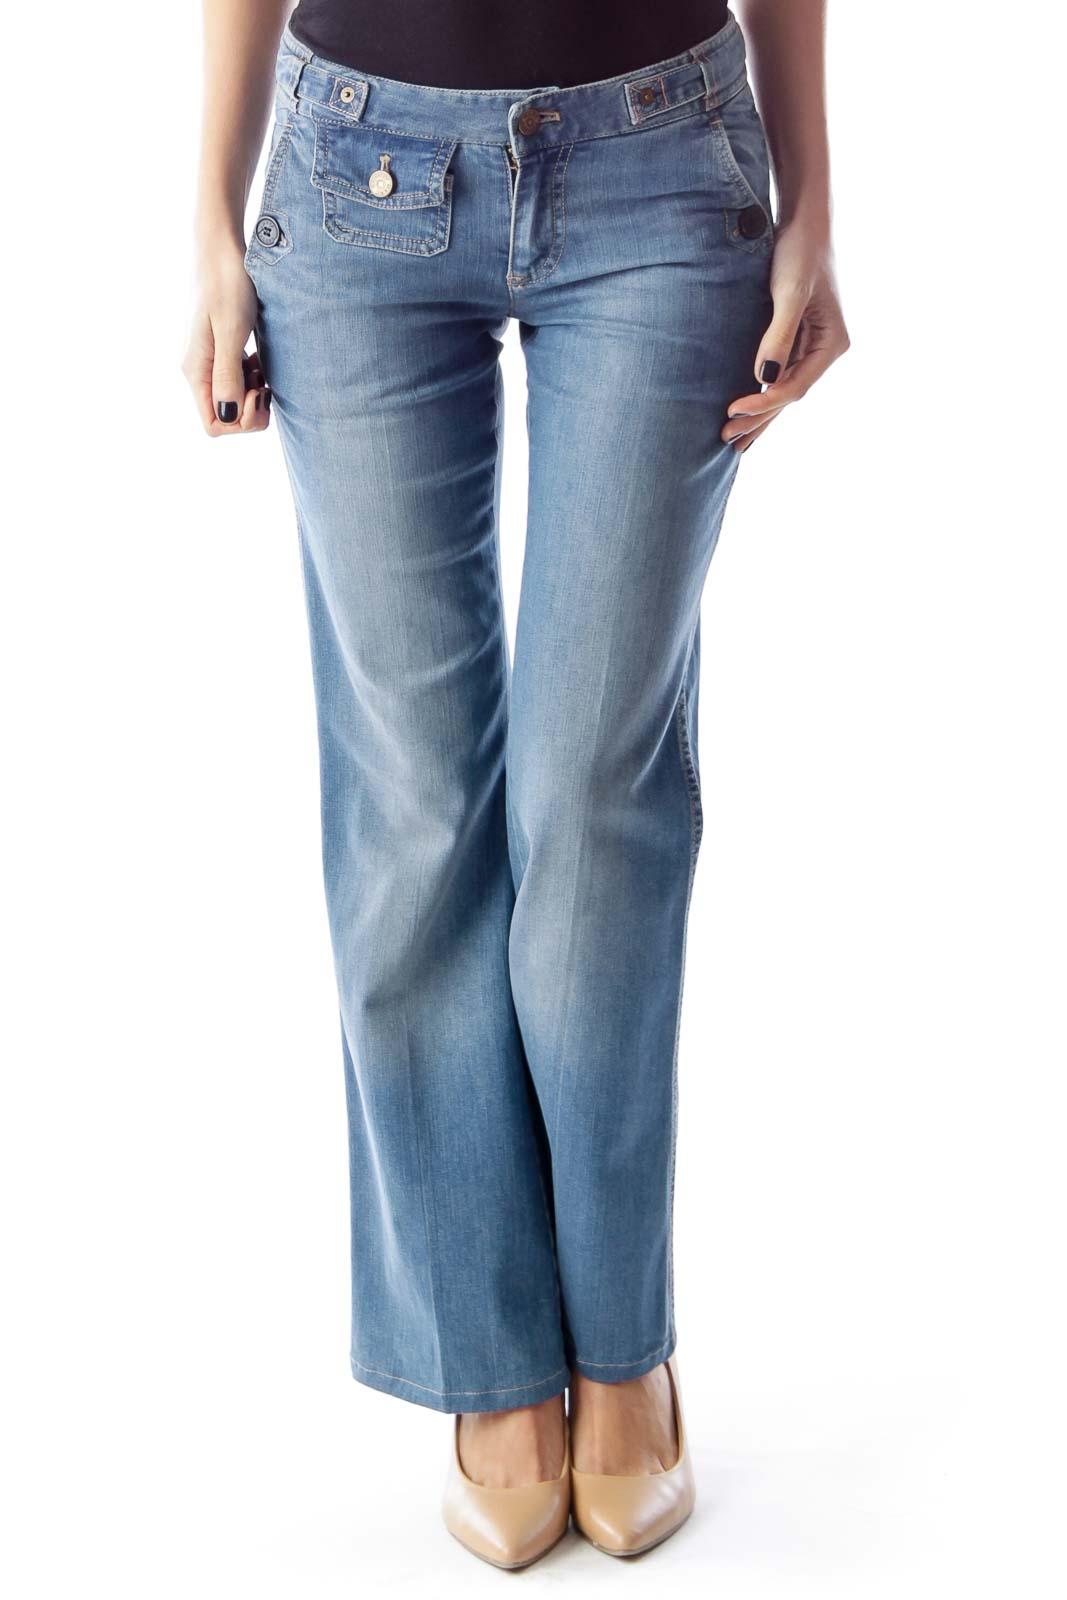 Light Blue Flare Jeans Front